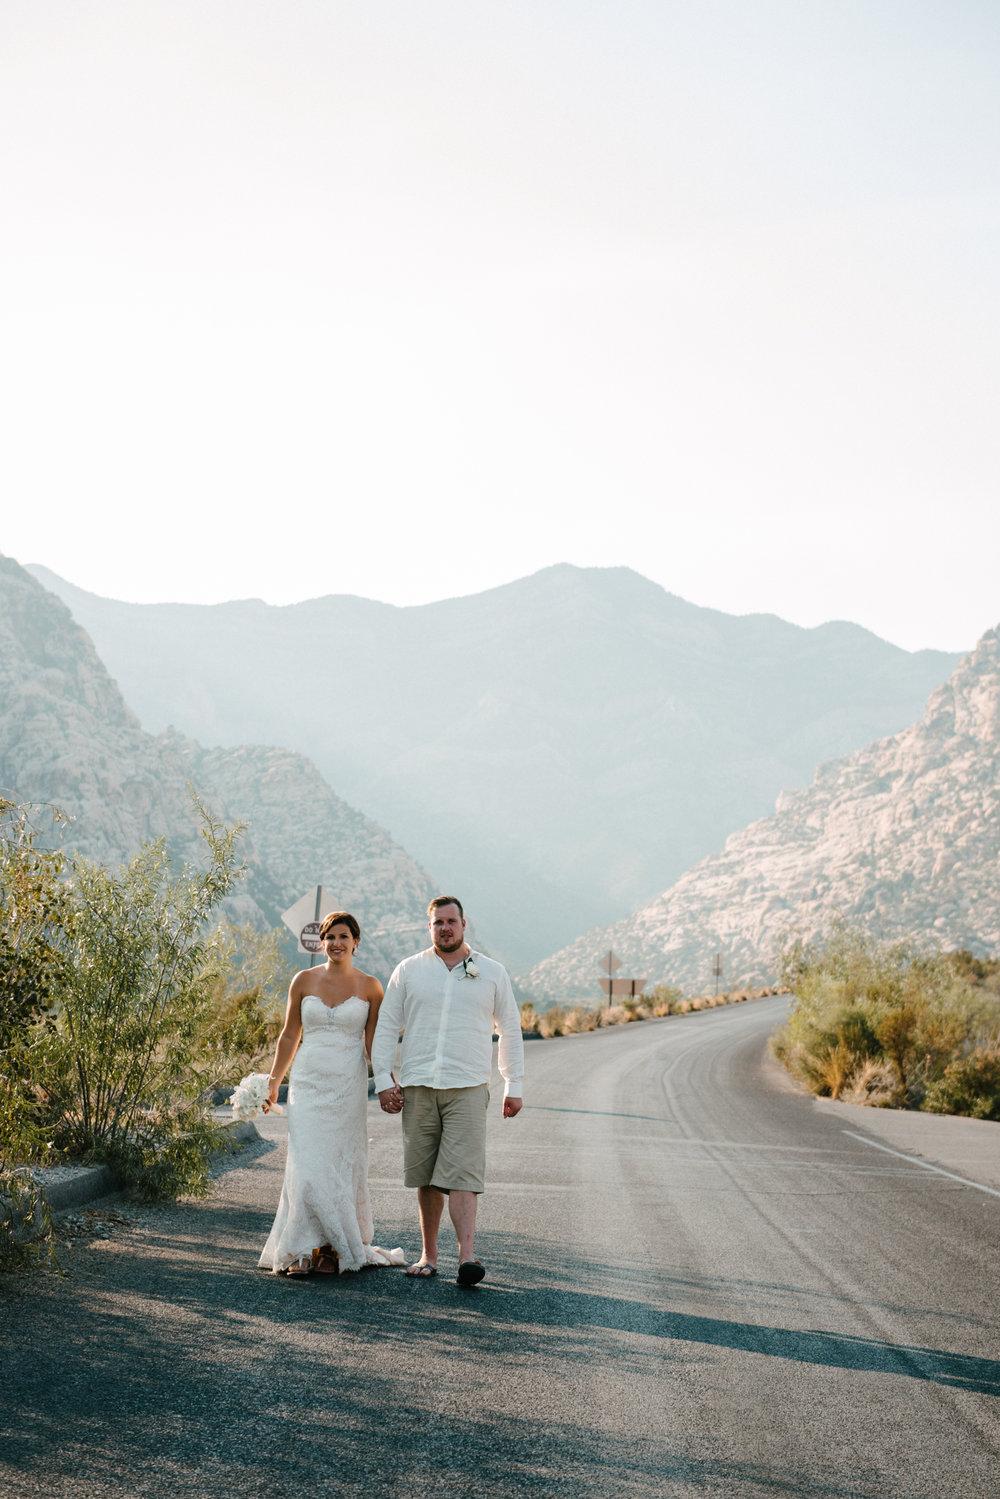 046_Redrock_canyon_vegas_wedding_photographer.jpg